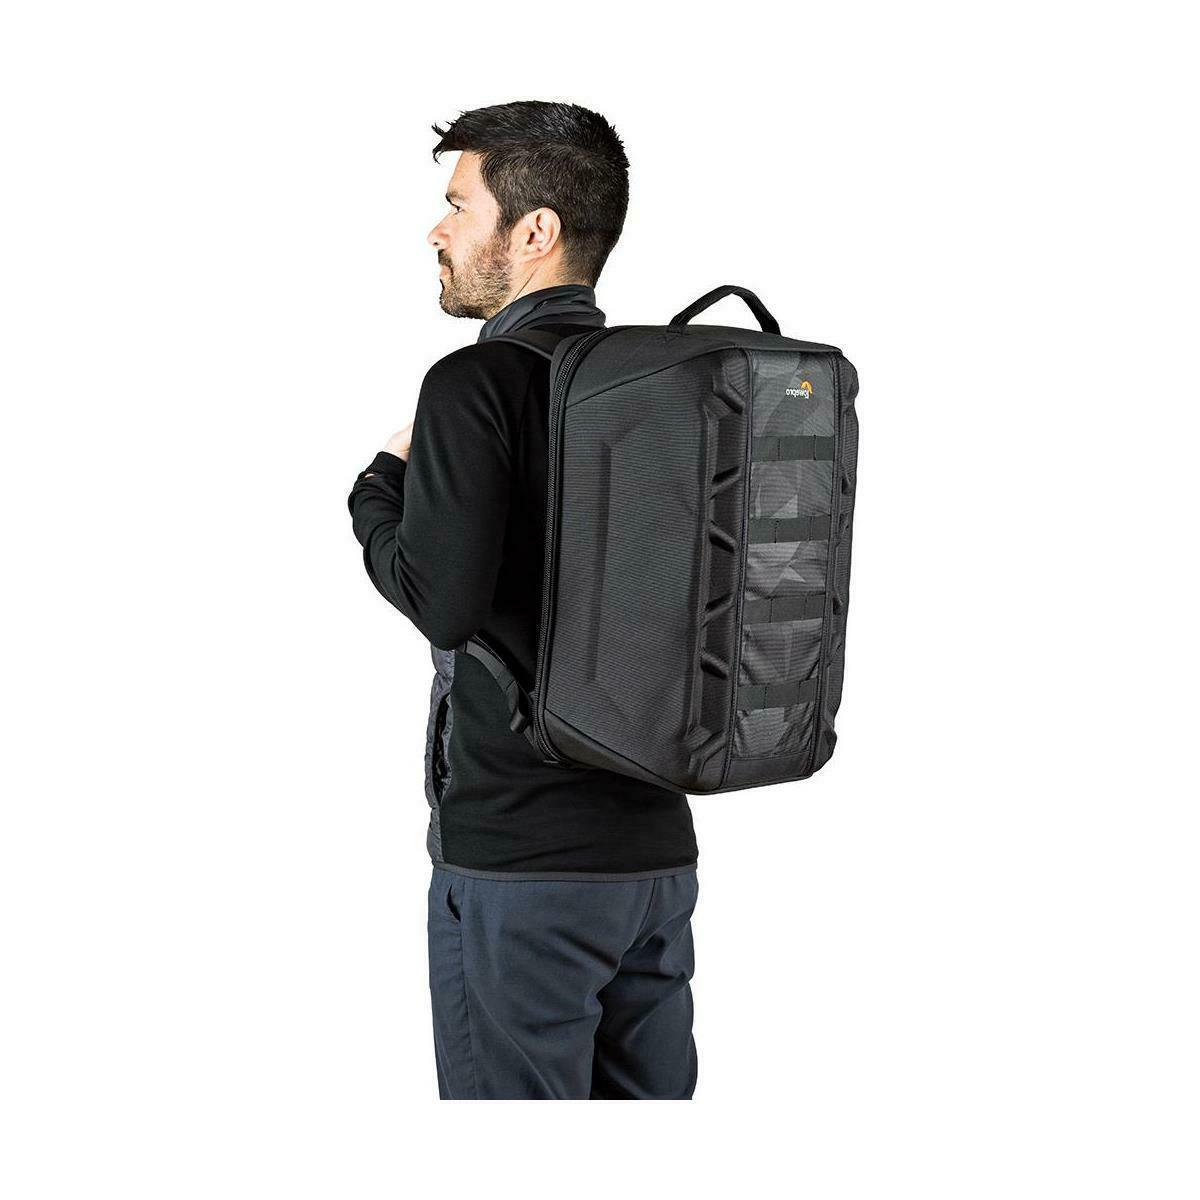 Lowepro Camera Bag Backpack DJI Phantom